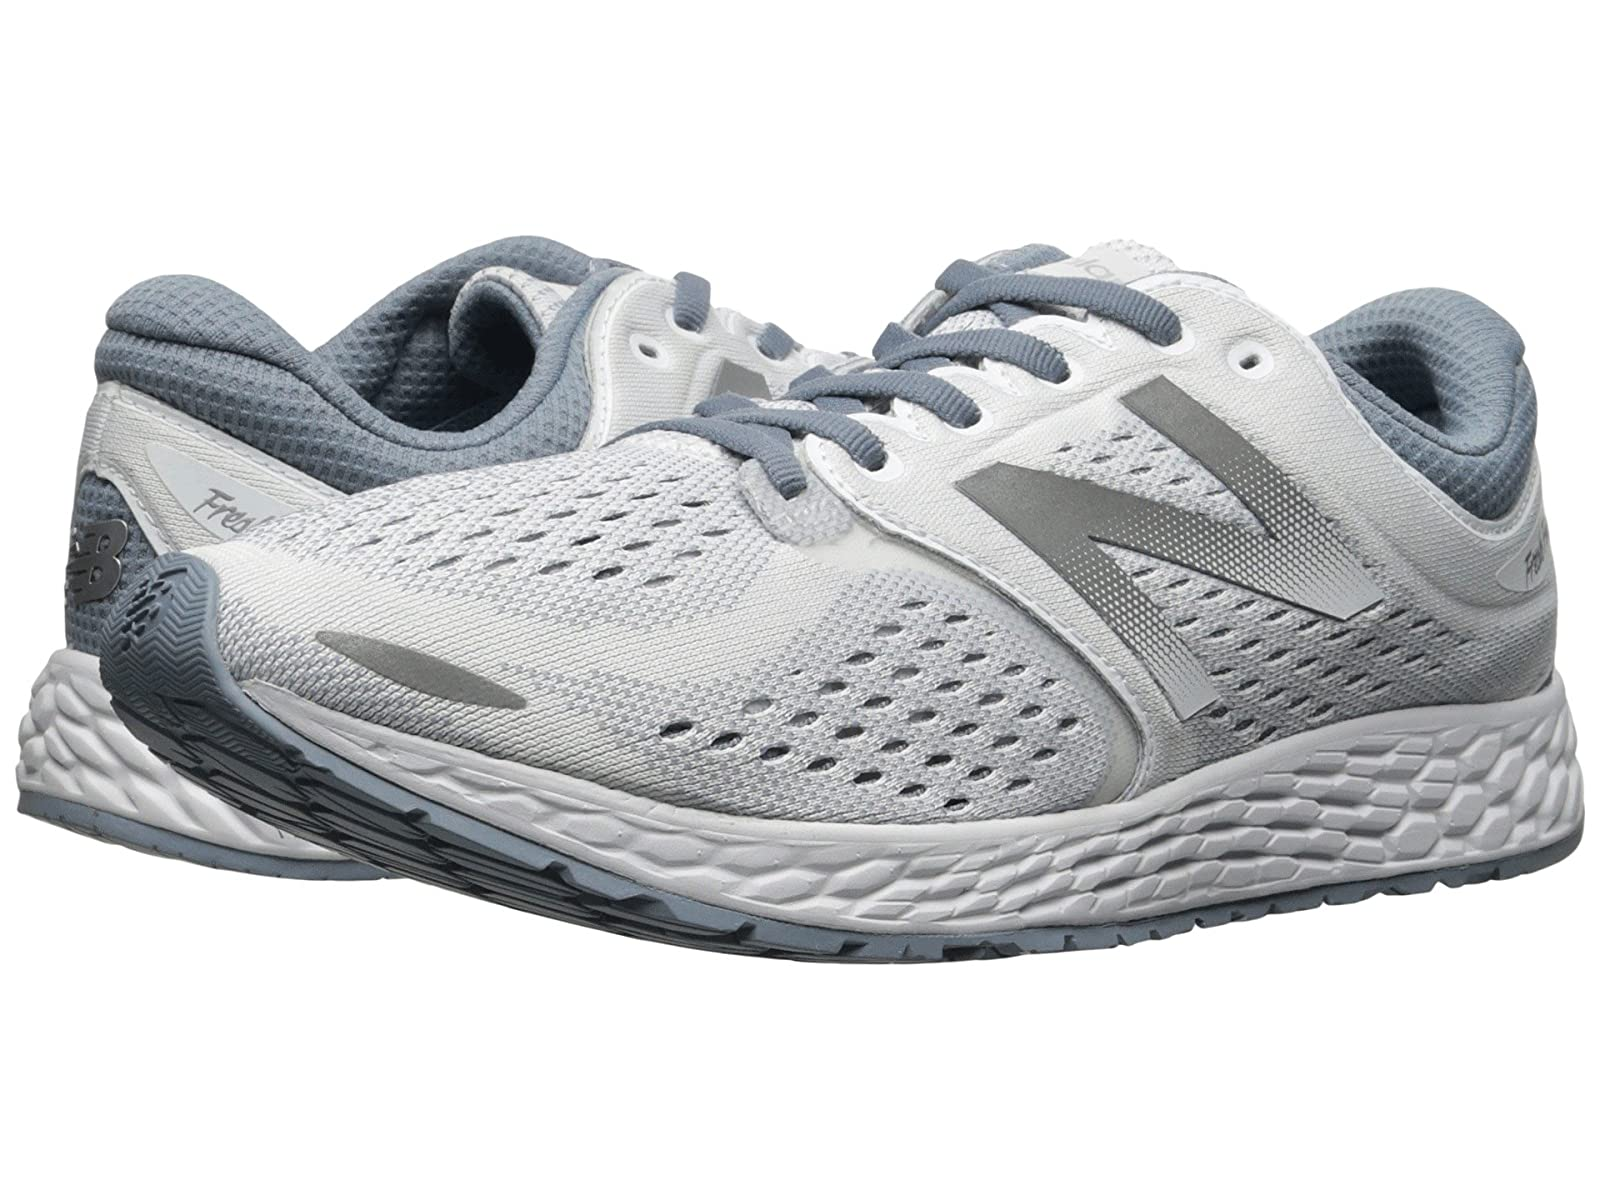 New Balance Zante v3 - Breathe PackCheap and distinctive eye-catching shoes